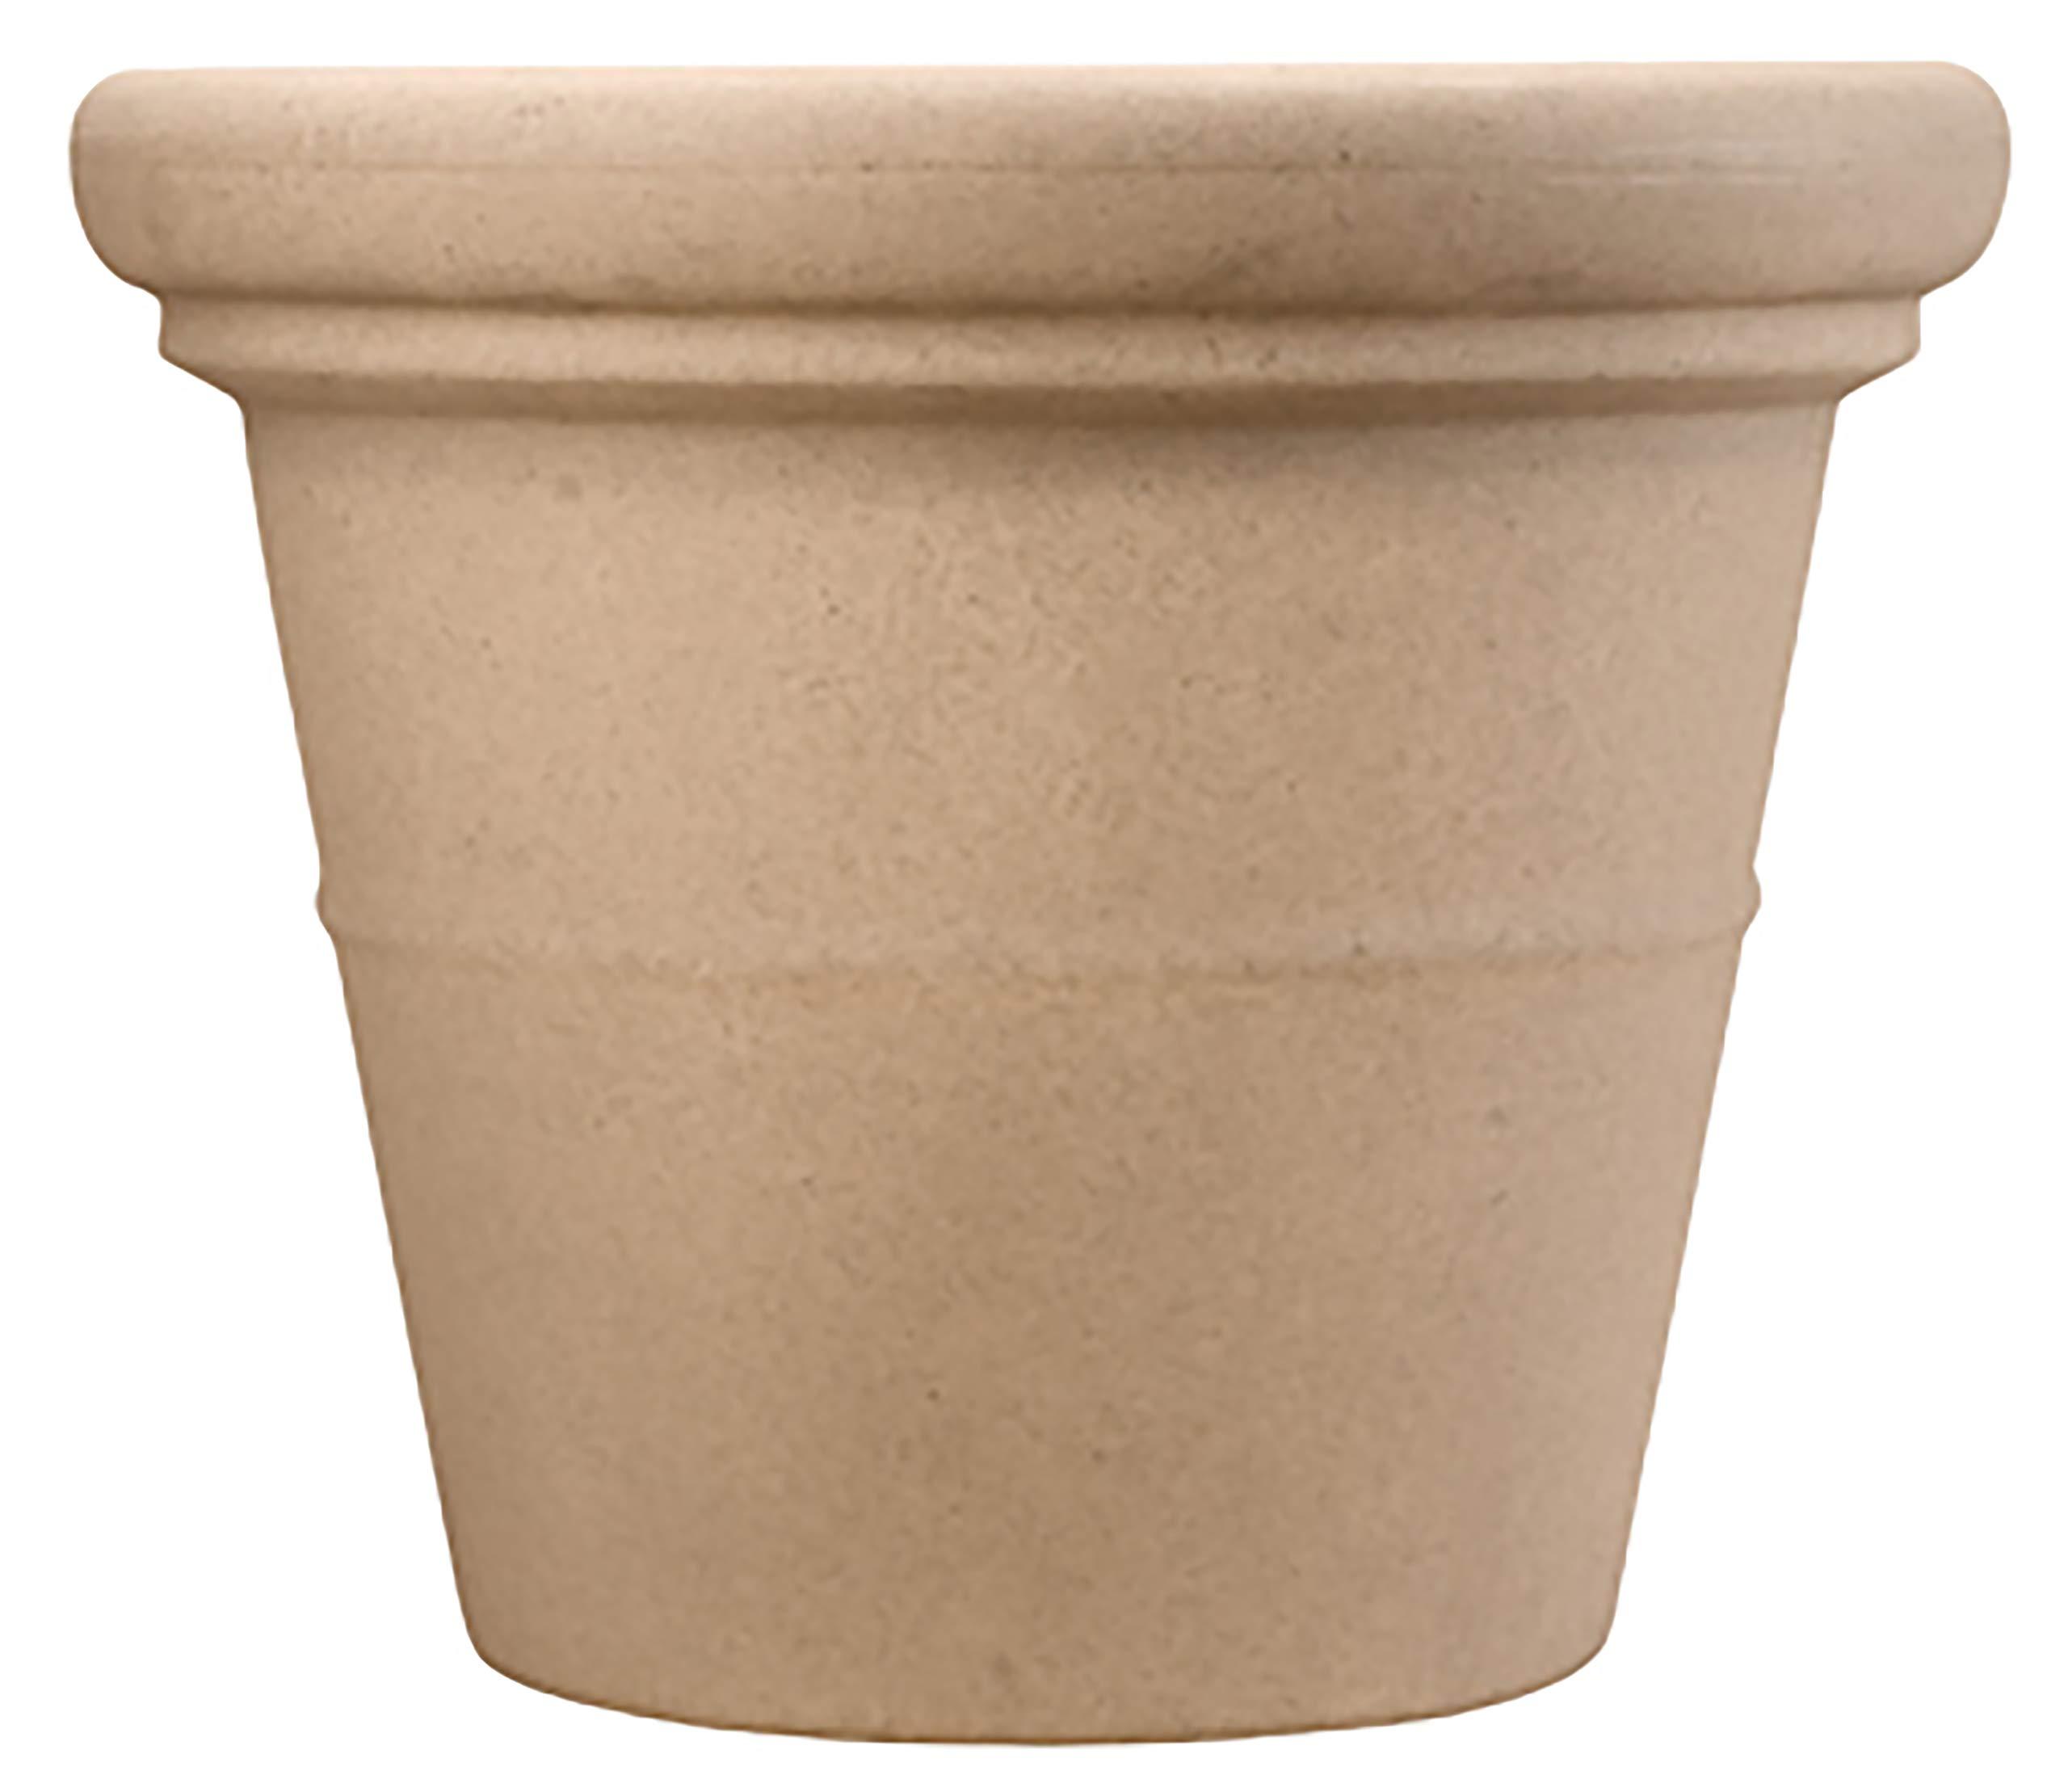 Akro-Mils TEA30000A34 Terrazzo Round Planter with Heavy Rim, Sandstone, 30-Inch